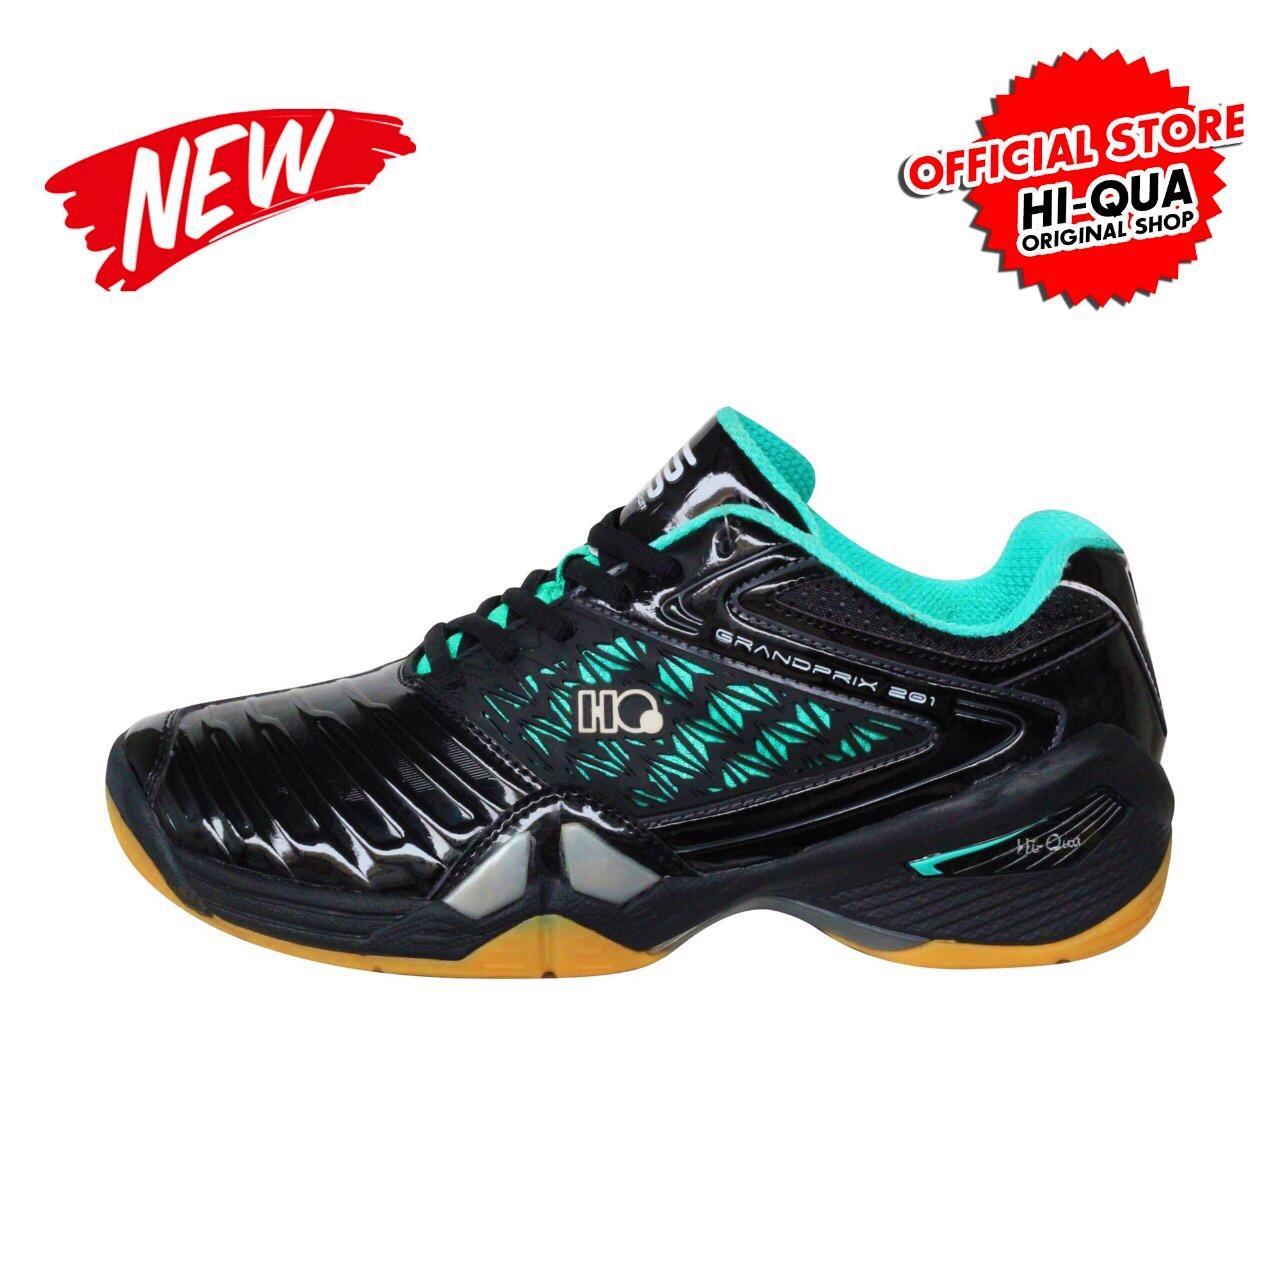 New 2018! Sepatu Bulutangkis/Badminton/Olahraga Hi-Qua New GrandPrix